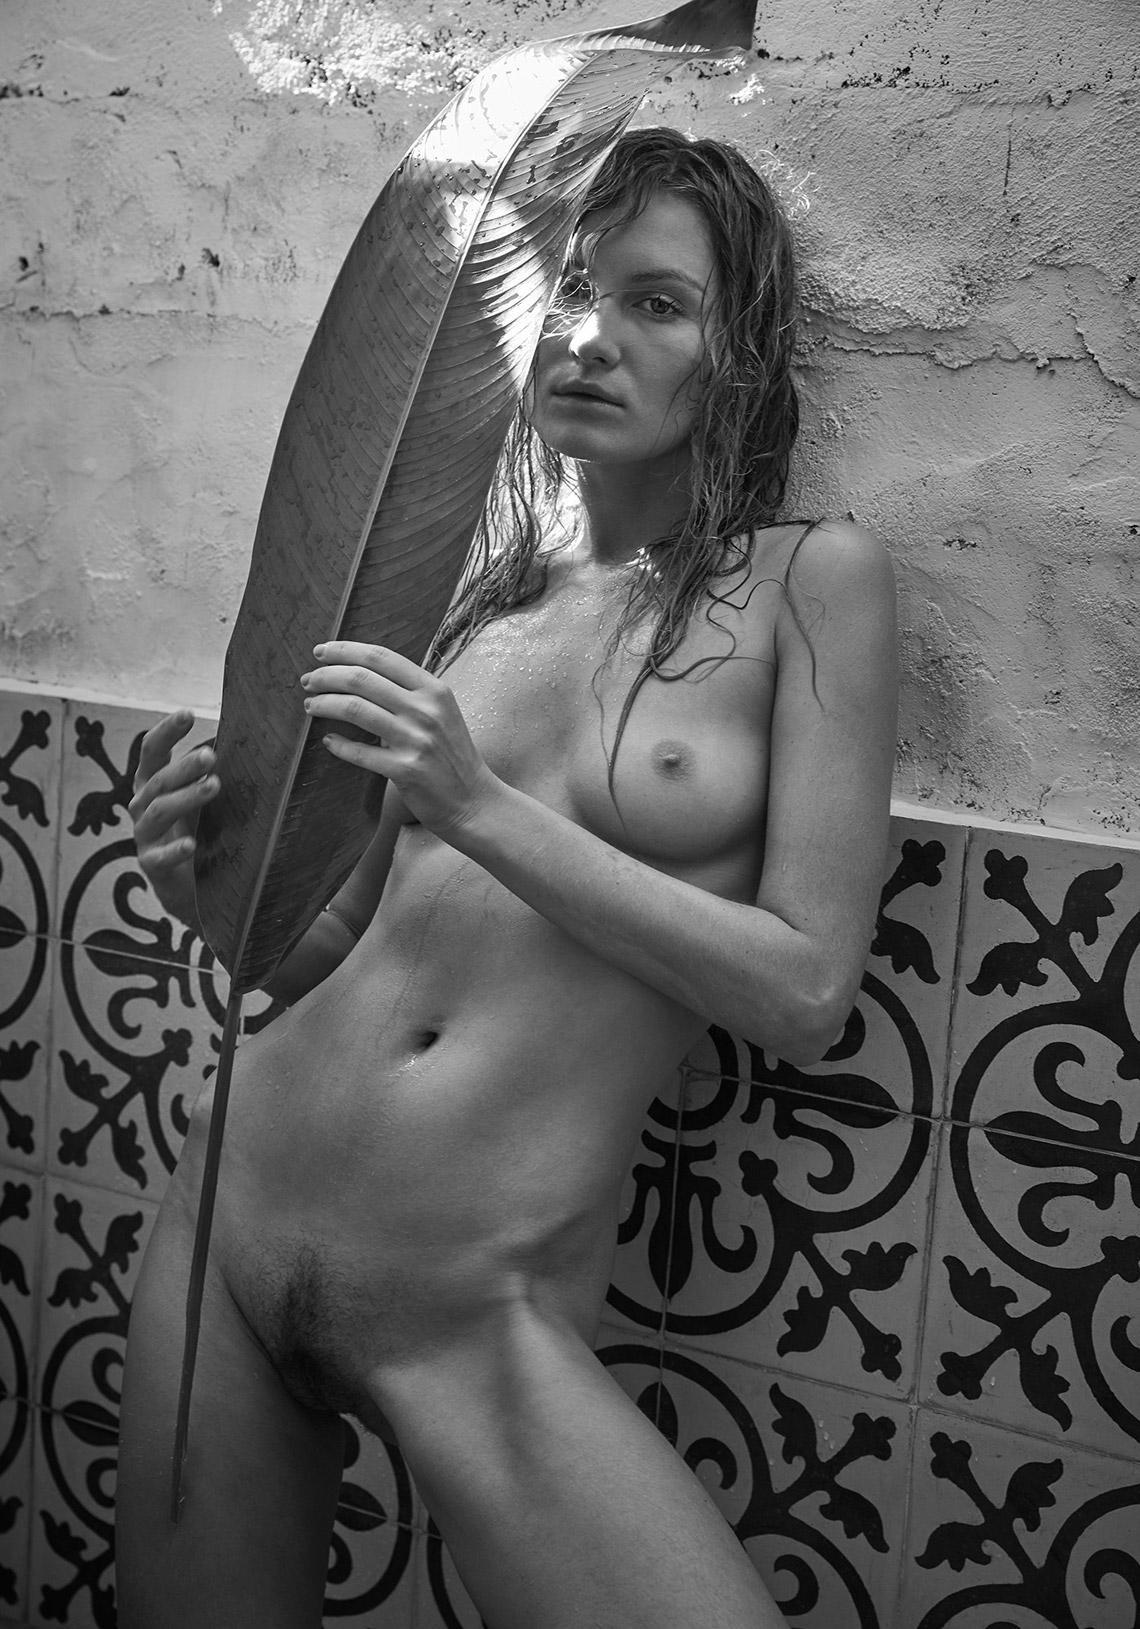 Kate Dyakonova - Gerhard Merzeder photoshoot